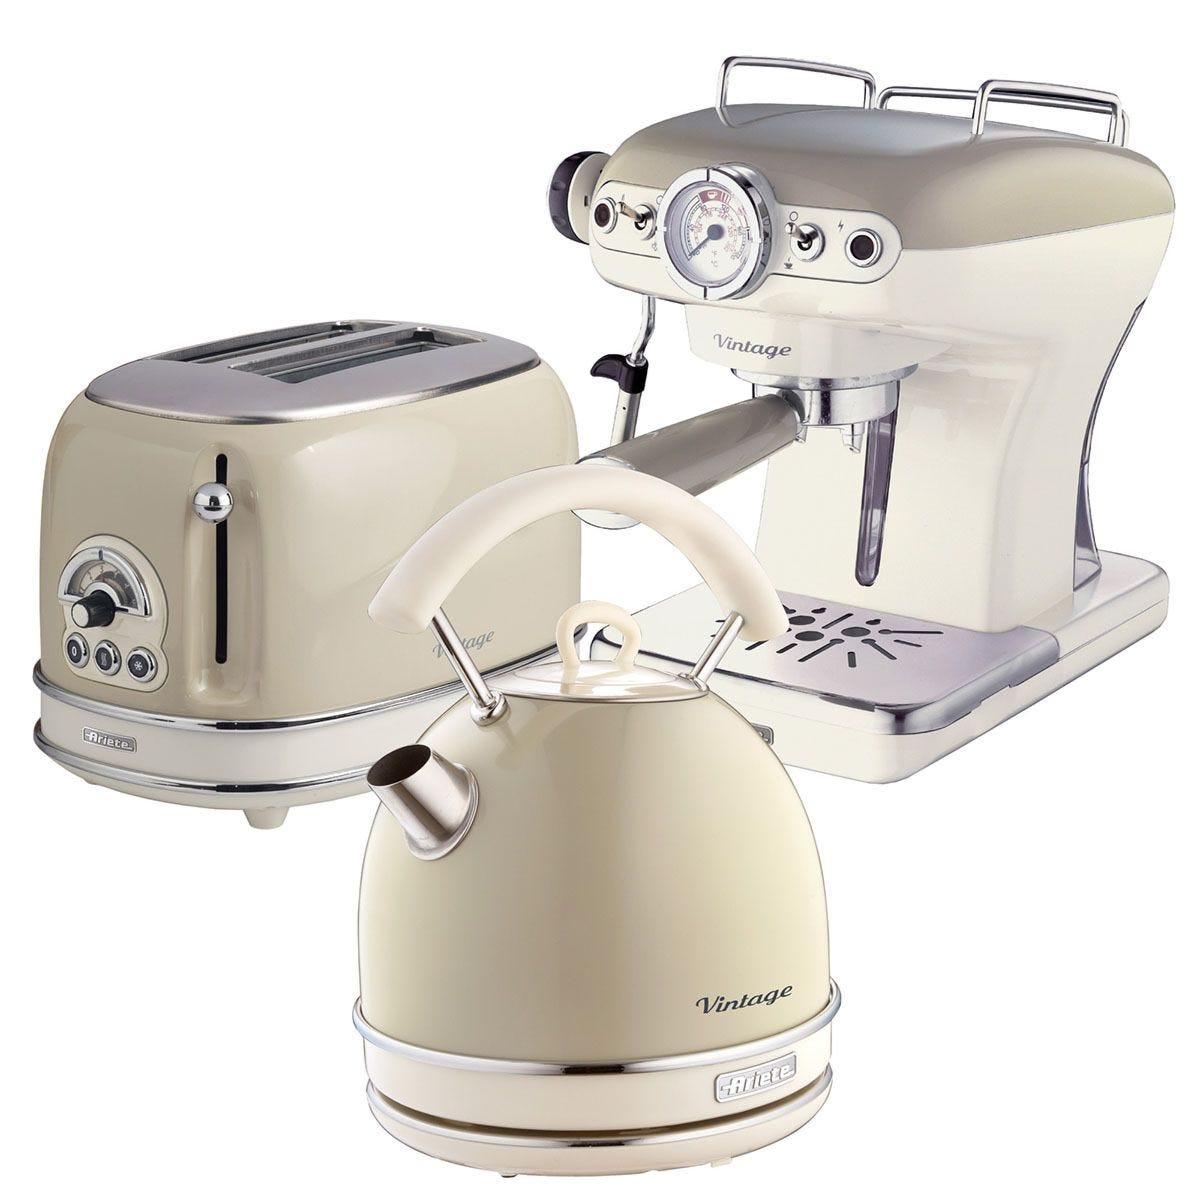 Ariete Vintage 2-Slice Toaster, 1.7L Dome Kettle, and Espresso Coffee Maker - Cream